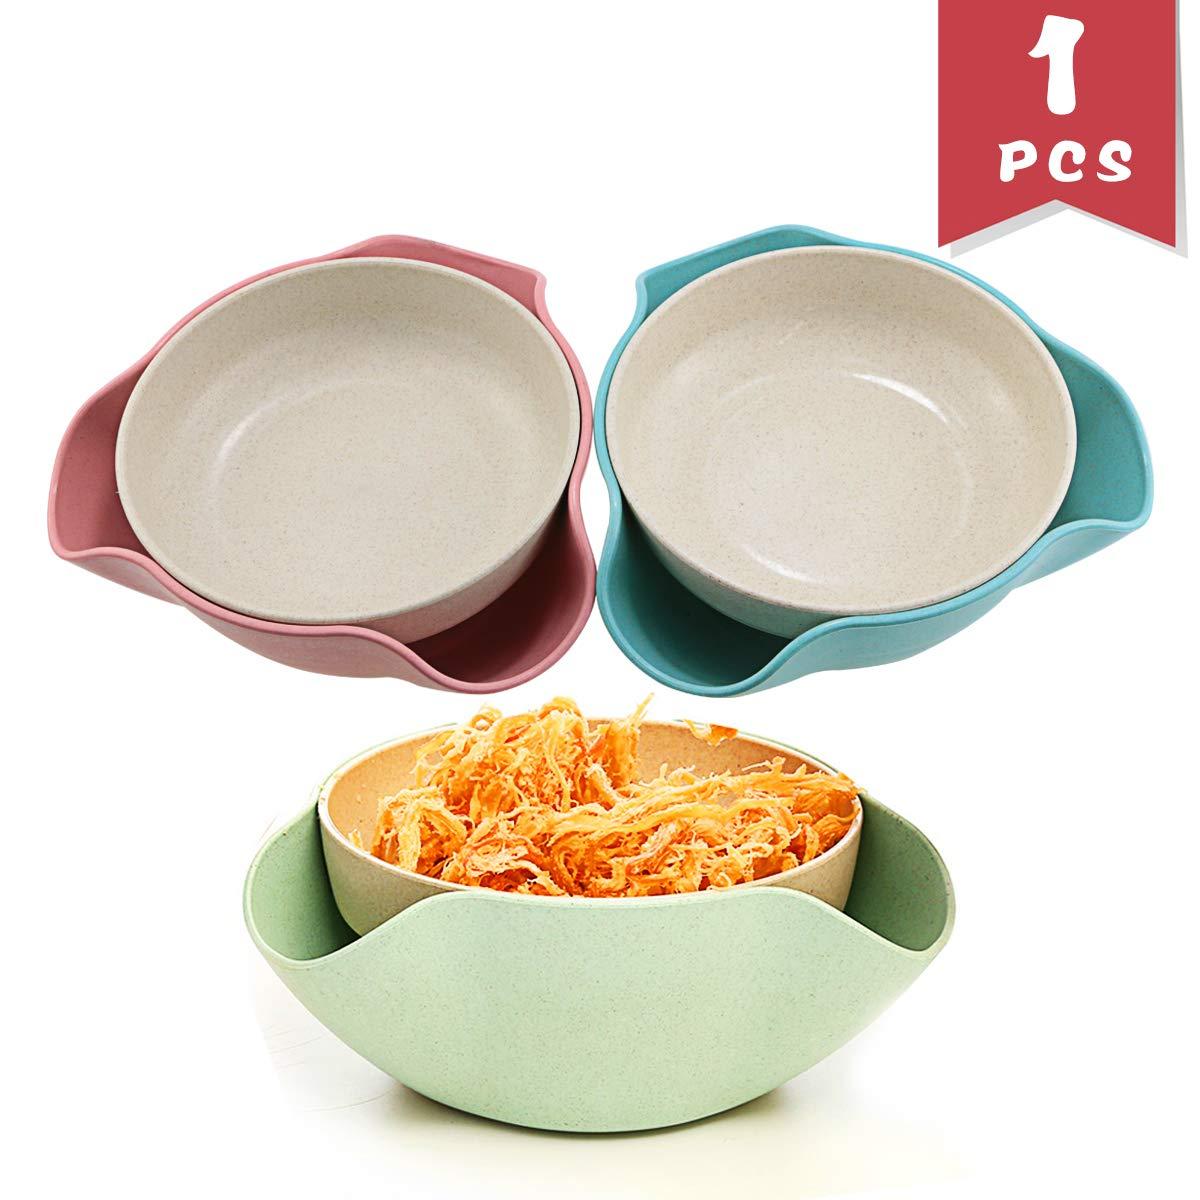 deebf分離可能Double Dishピスタチオボウル、スナックServing Bowl for Pistachios、ピーナッツ、枝豆、サクランボ、ナット、フルーツ、キャンディー、スナック、フルーツDisc   B07DRB6Q6T